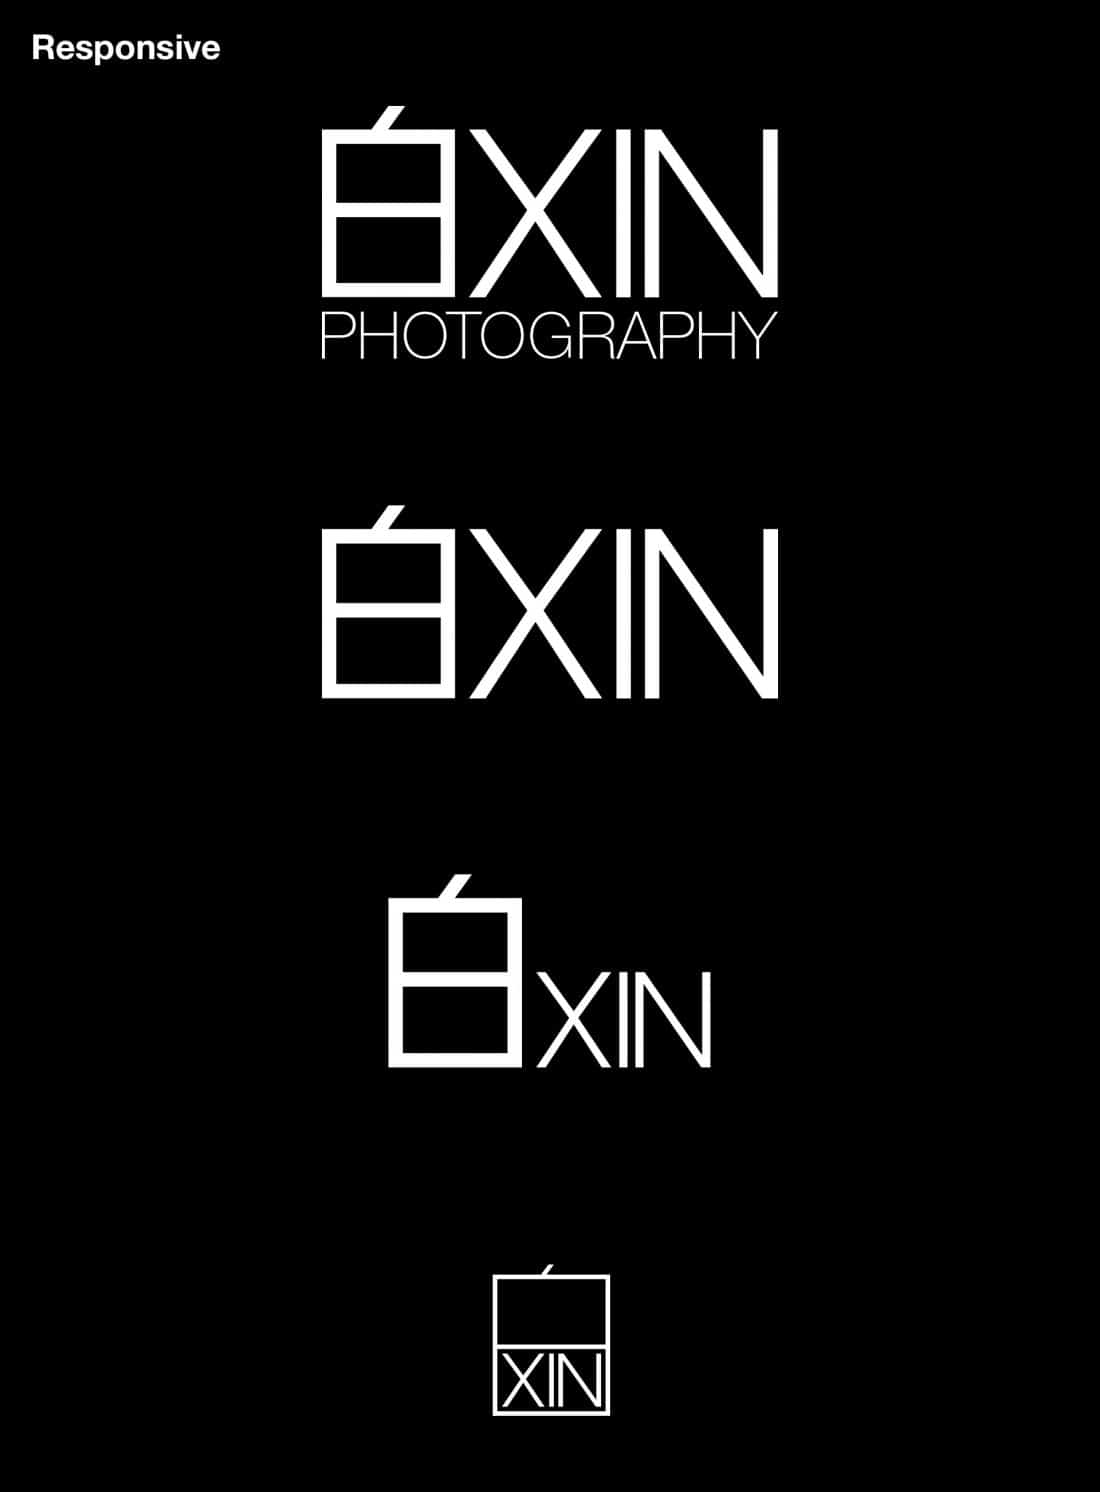 Xin Photography Branding 02